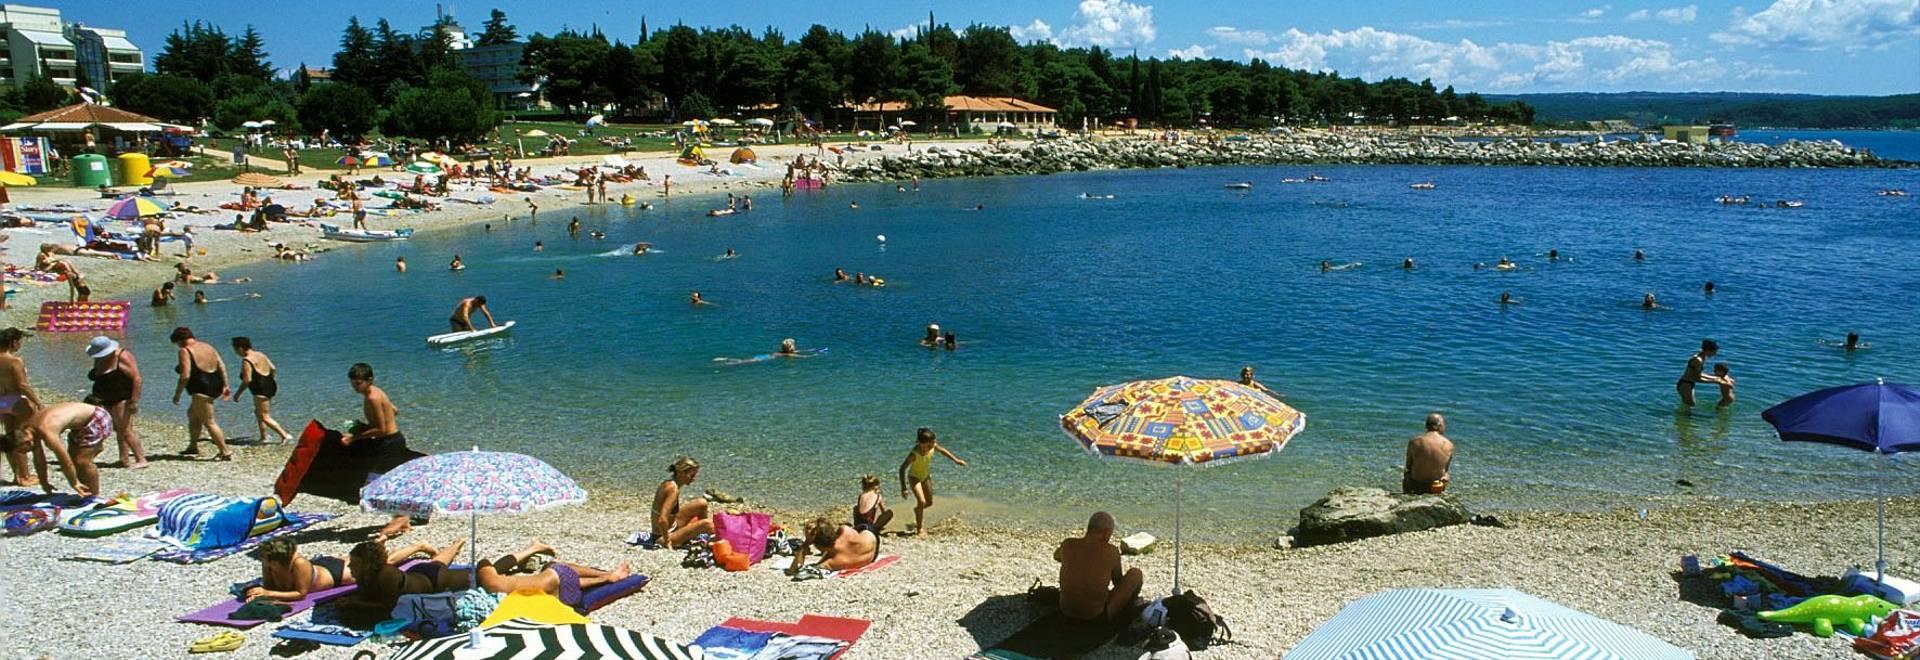 Sea Beaches   More Plaze Beaches   Plaze Novigrad Plaza Hotel Maestral 02